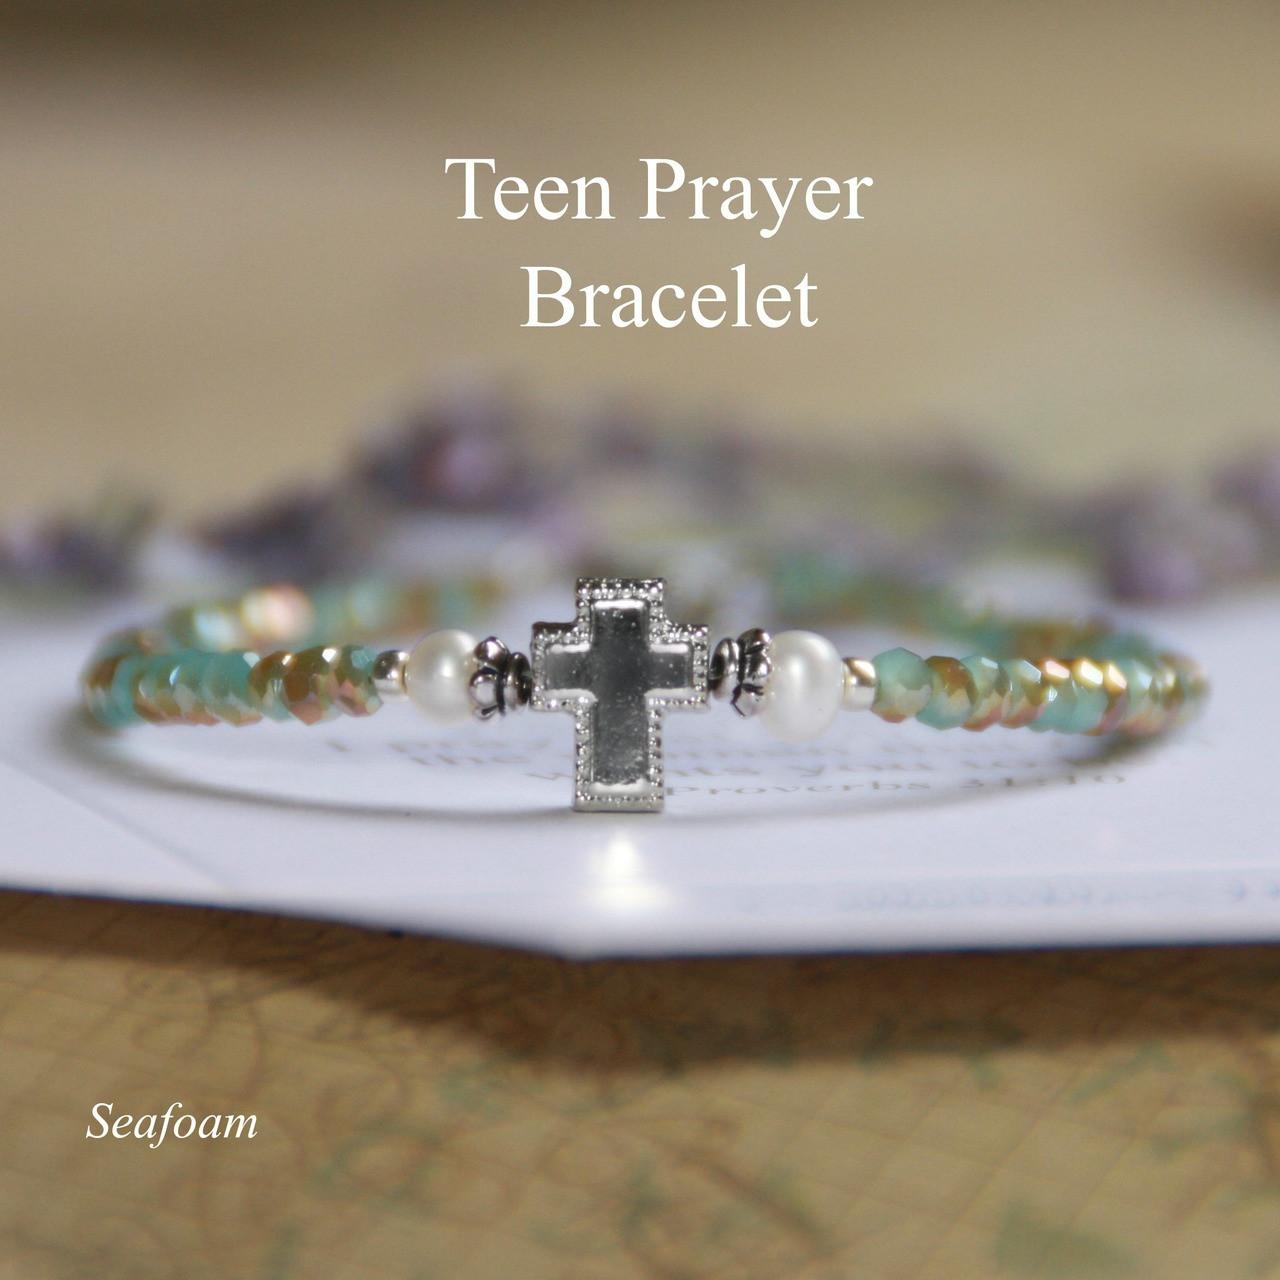 TN-4  Teen Prayer Bracelet-Seafoam (see additional colors)